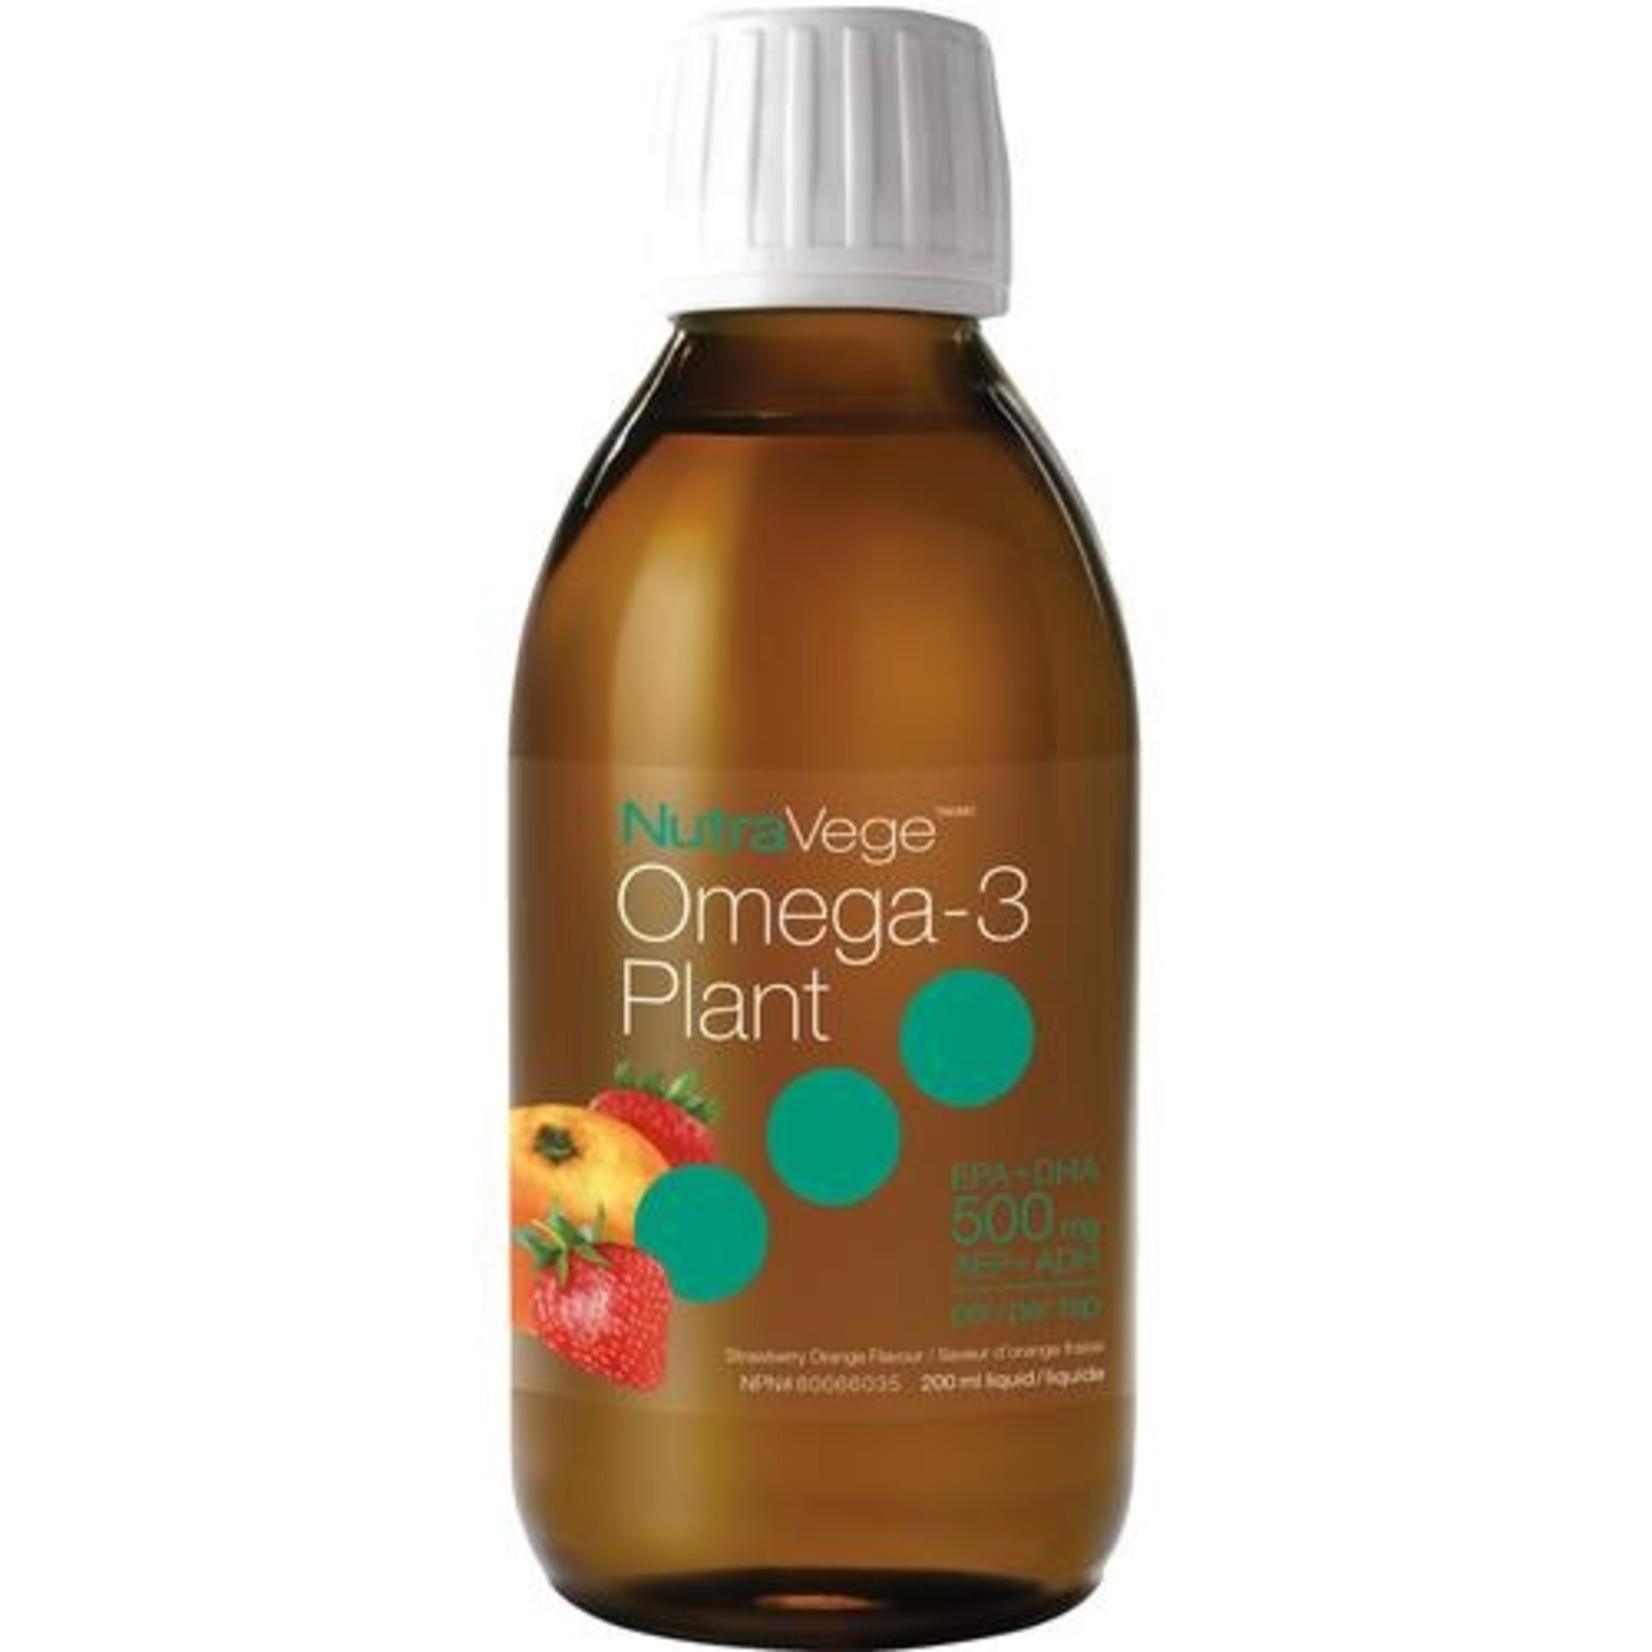 Nature's Way NutraVege Omega-3 Plant - Strawberry Orange 200ml